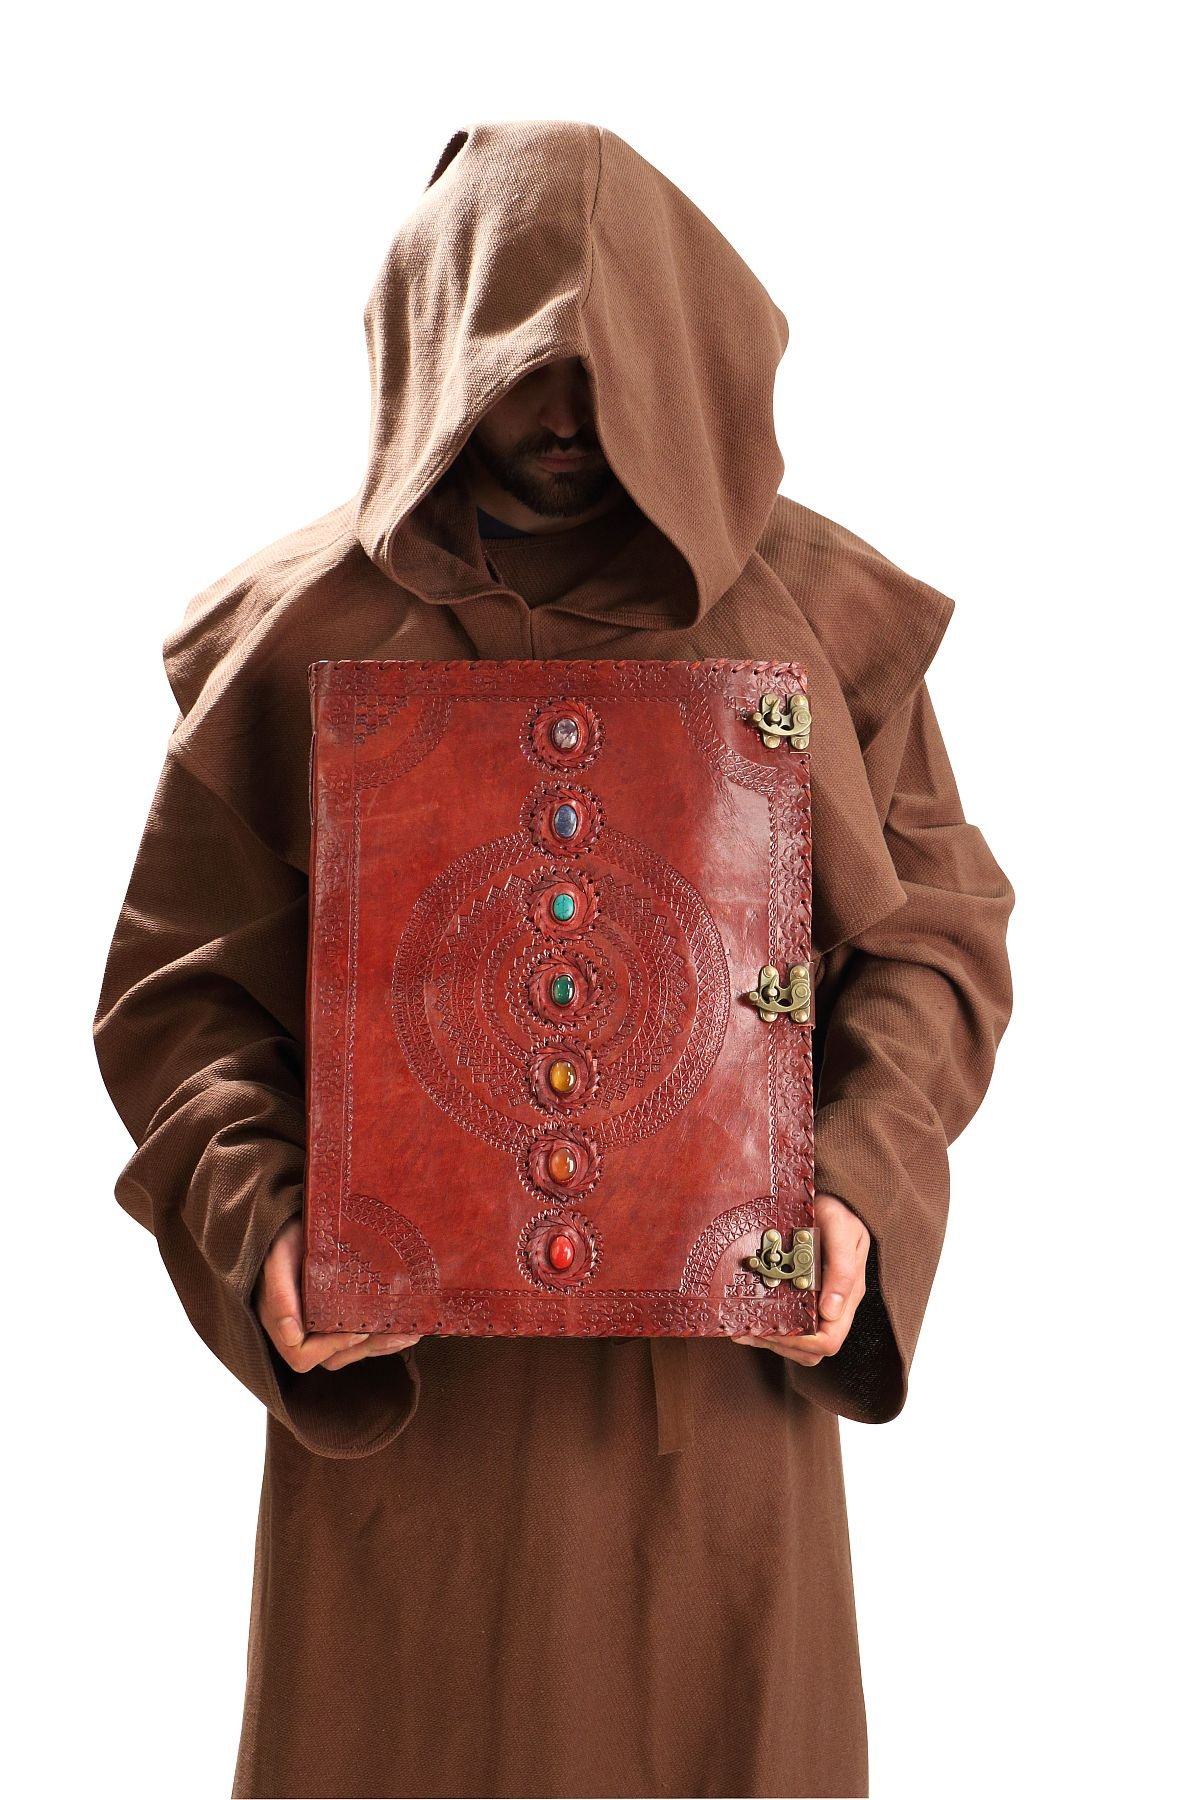 Massive Mystic Leather Journal Spellbook w/ 7 Chakra Stones